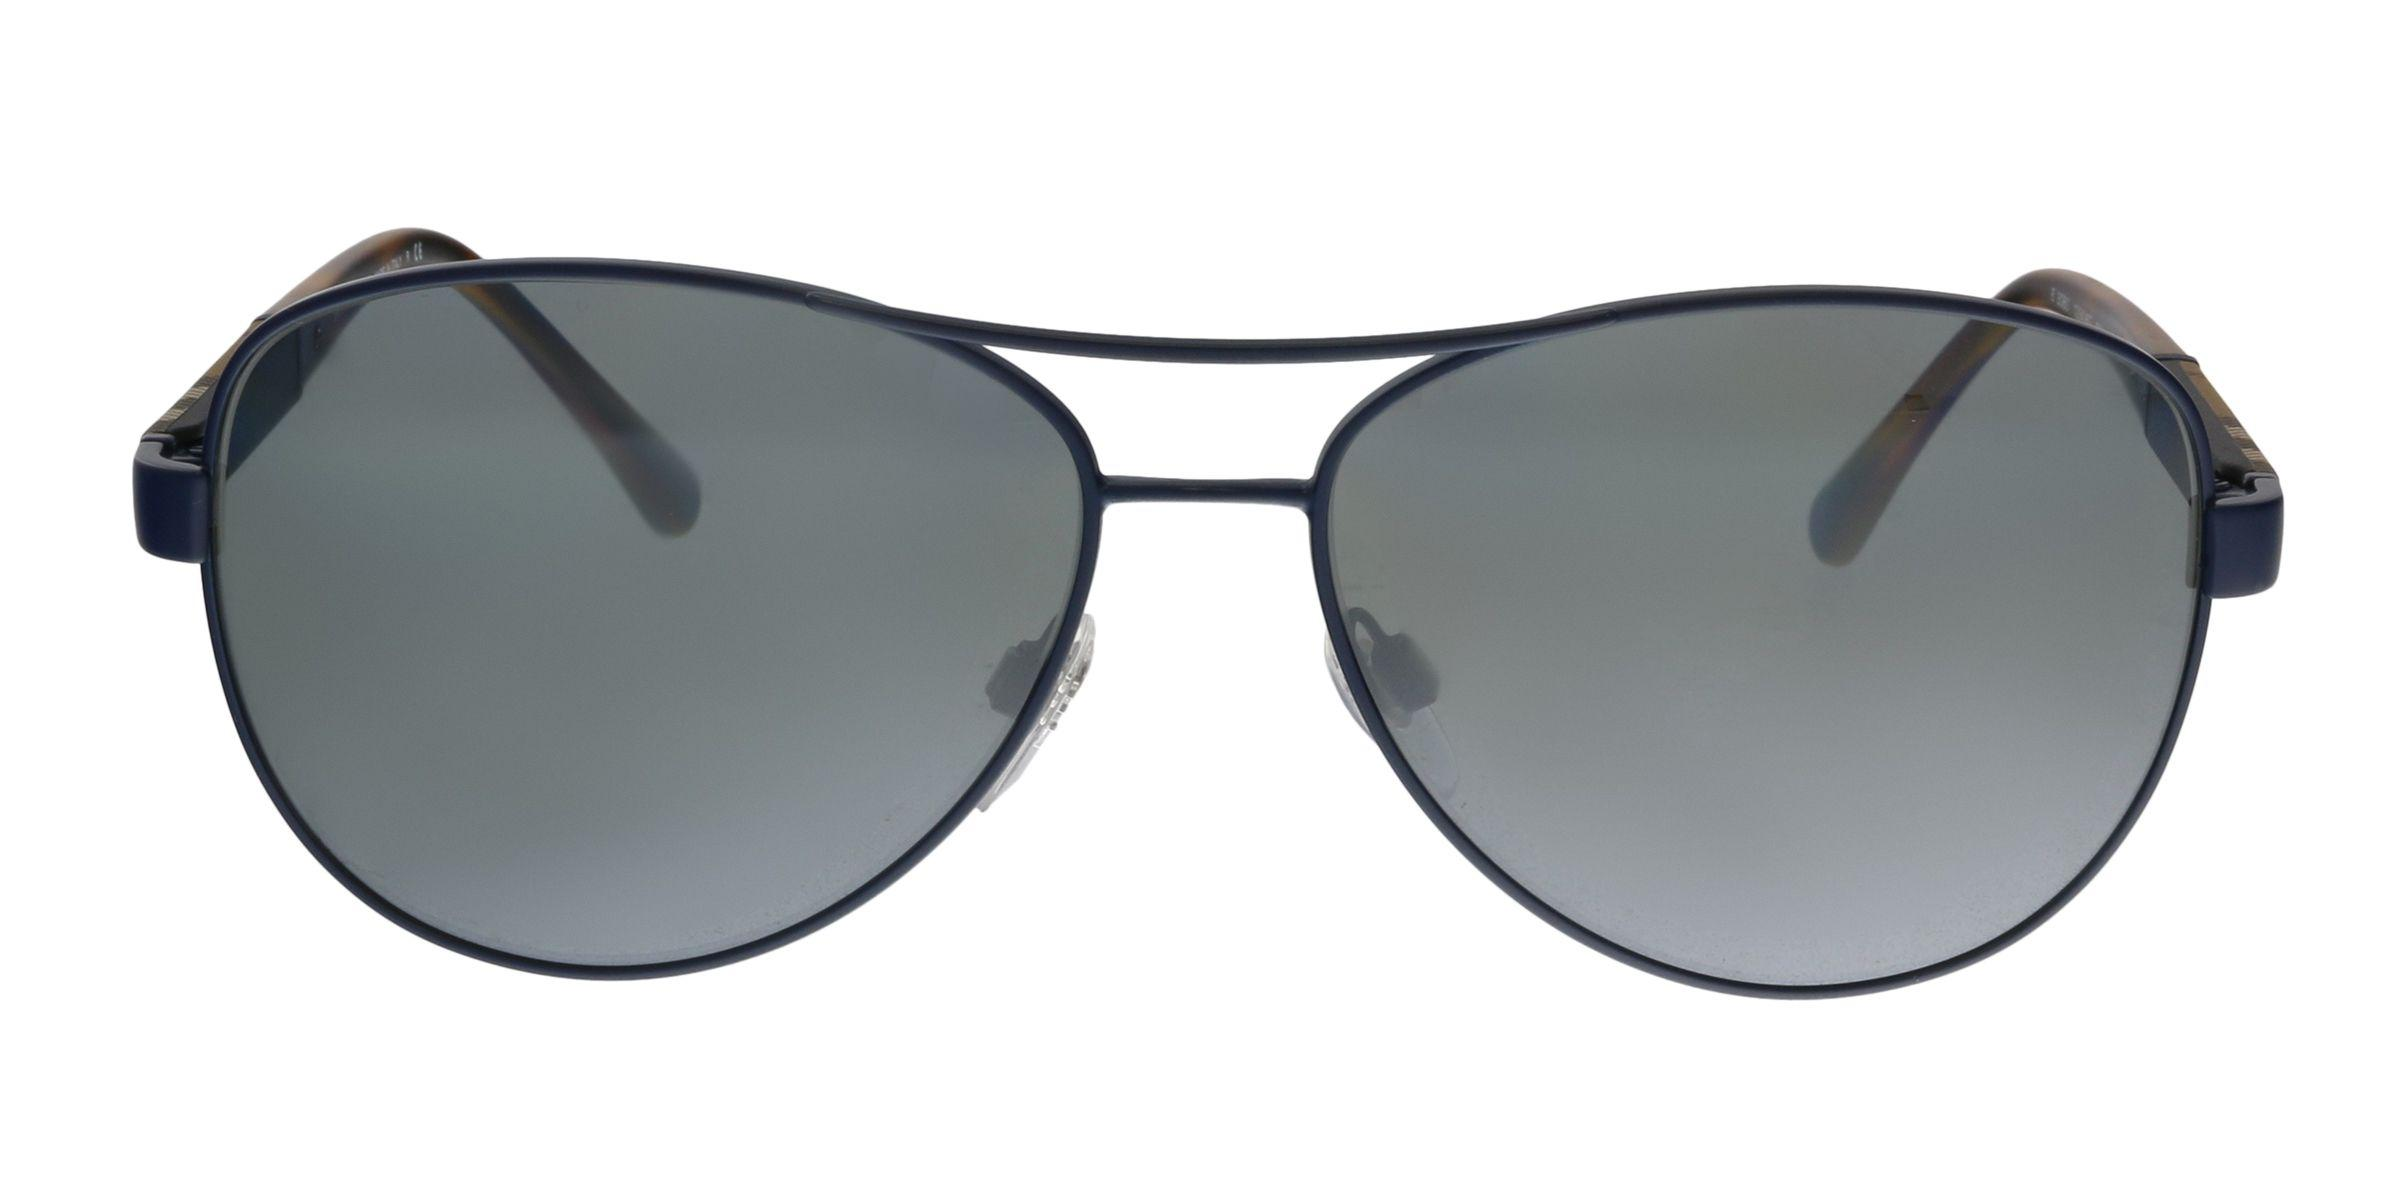 399c3cb6ab4 Burberry - Be3080 12346g Matte Blue Aviator Sunglasses - Lyst. View  fullscreen